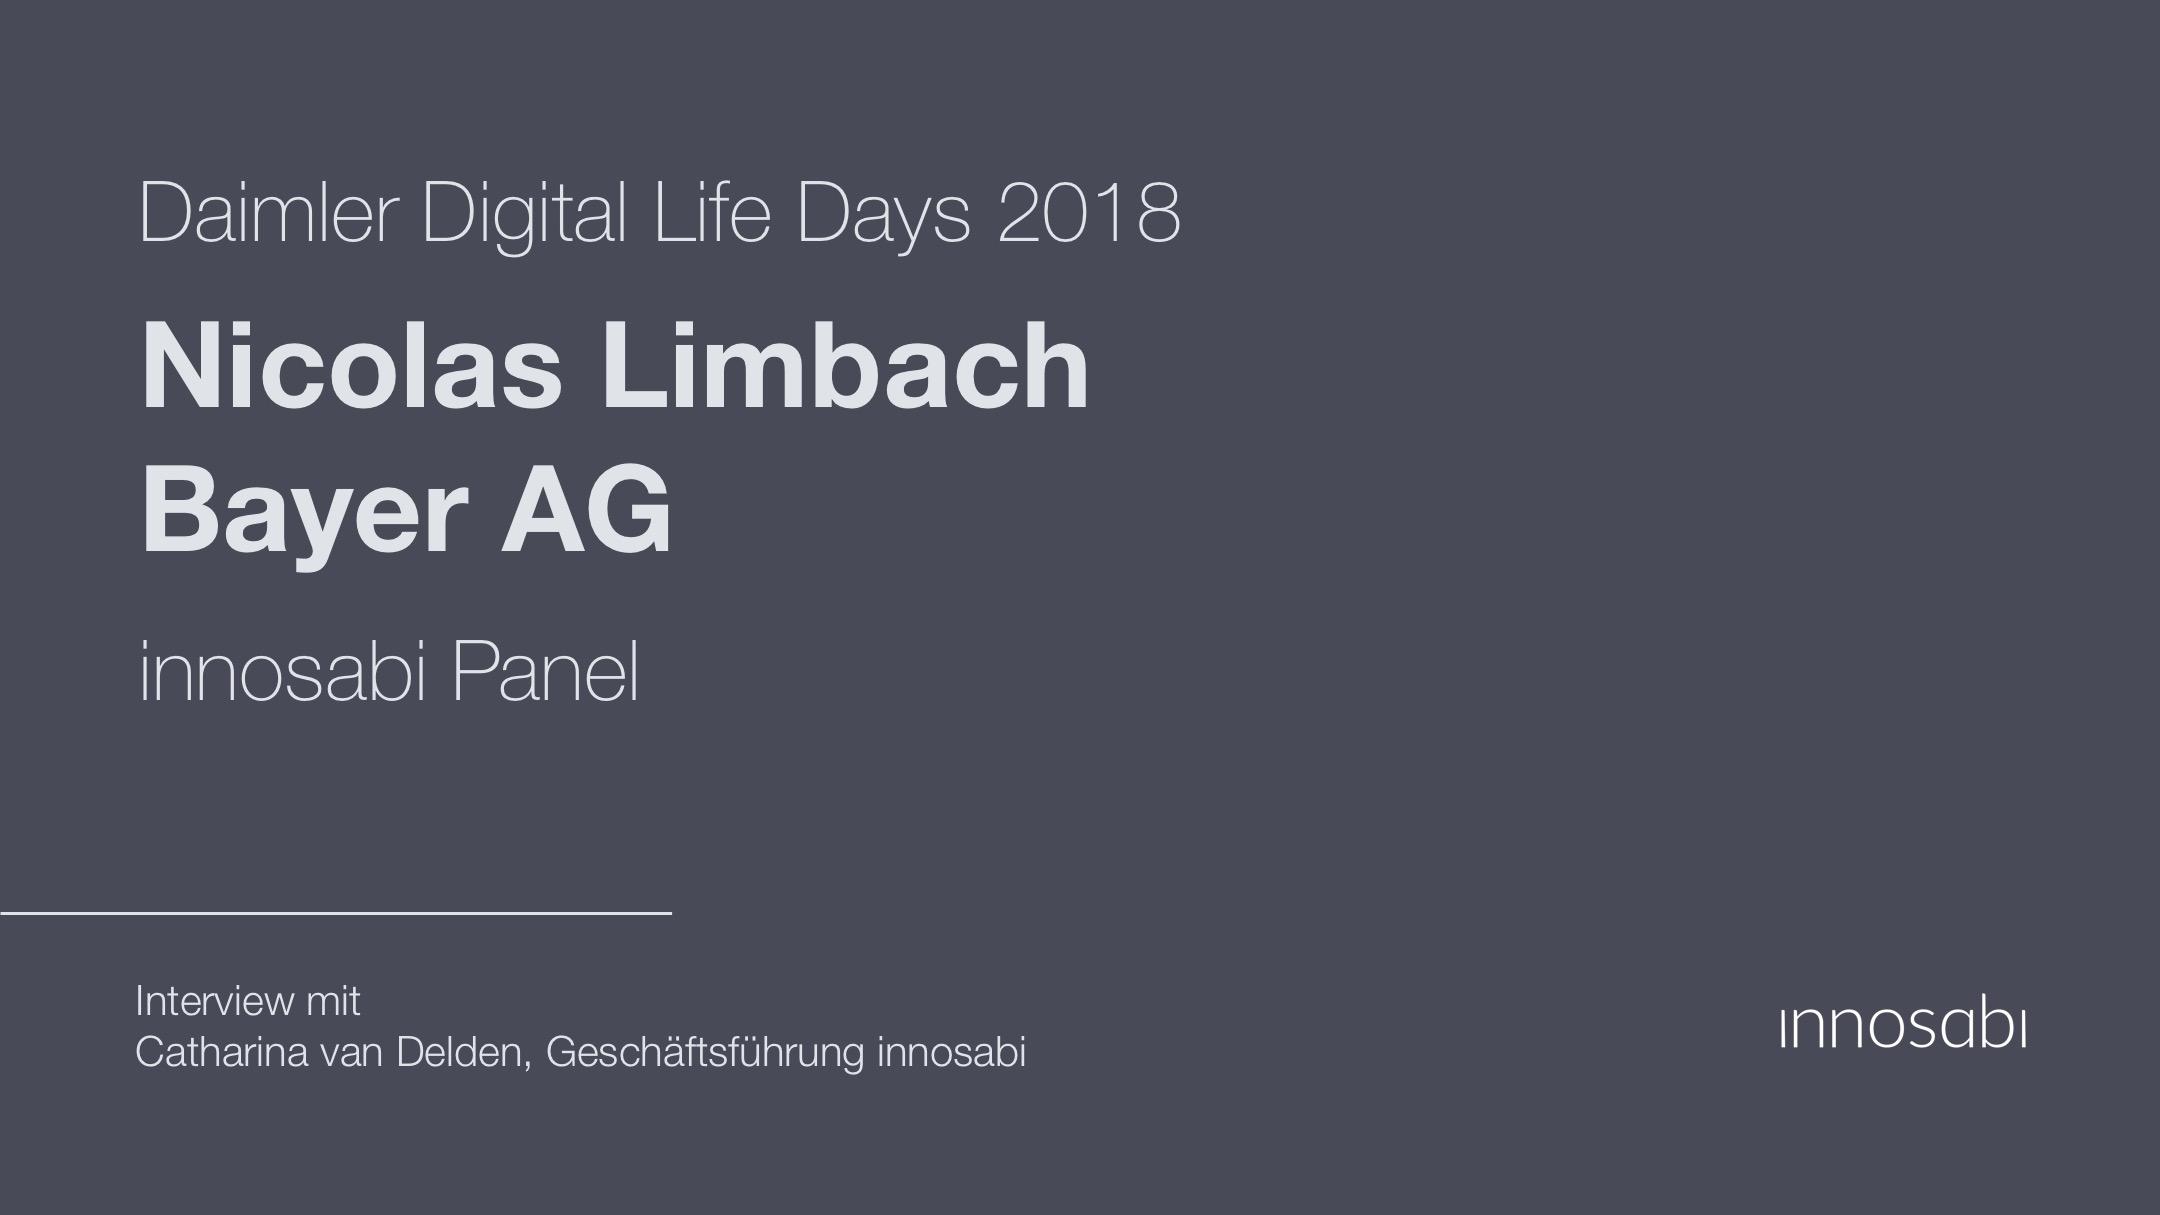 Interview mit Nicolas Limbach - Bayer AG